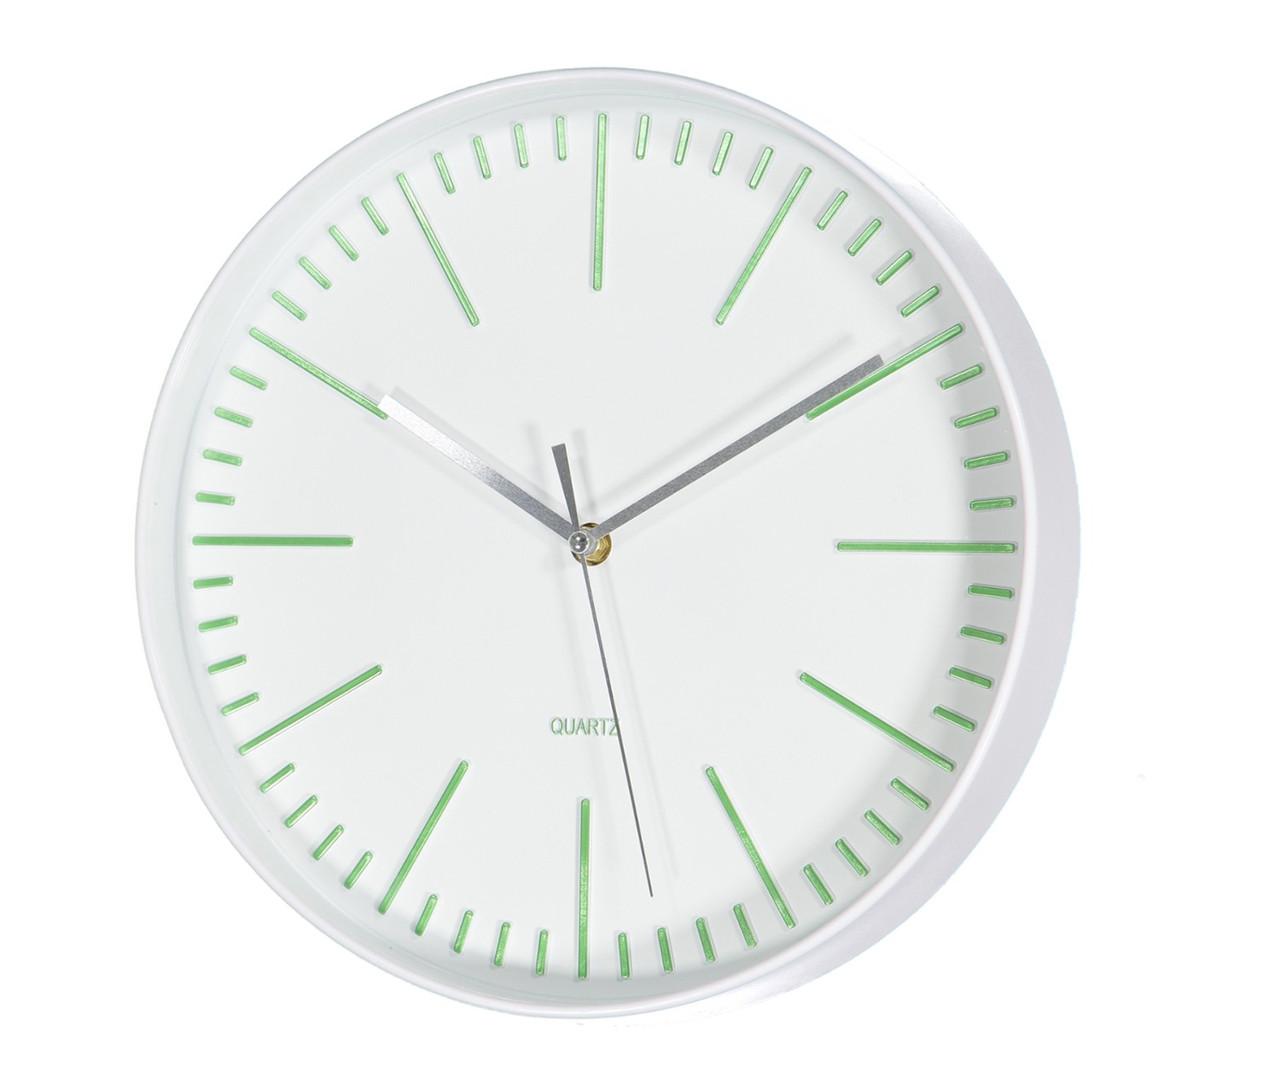 Настенные часы белый пластик d30см 3869600 3869600 3869600